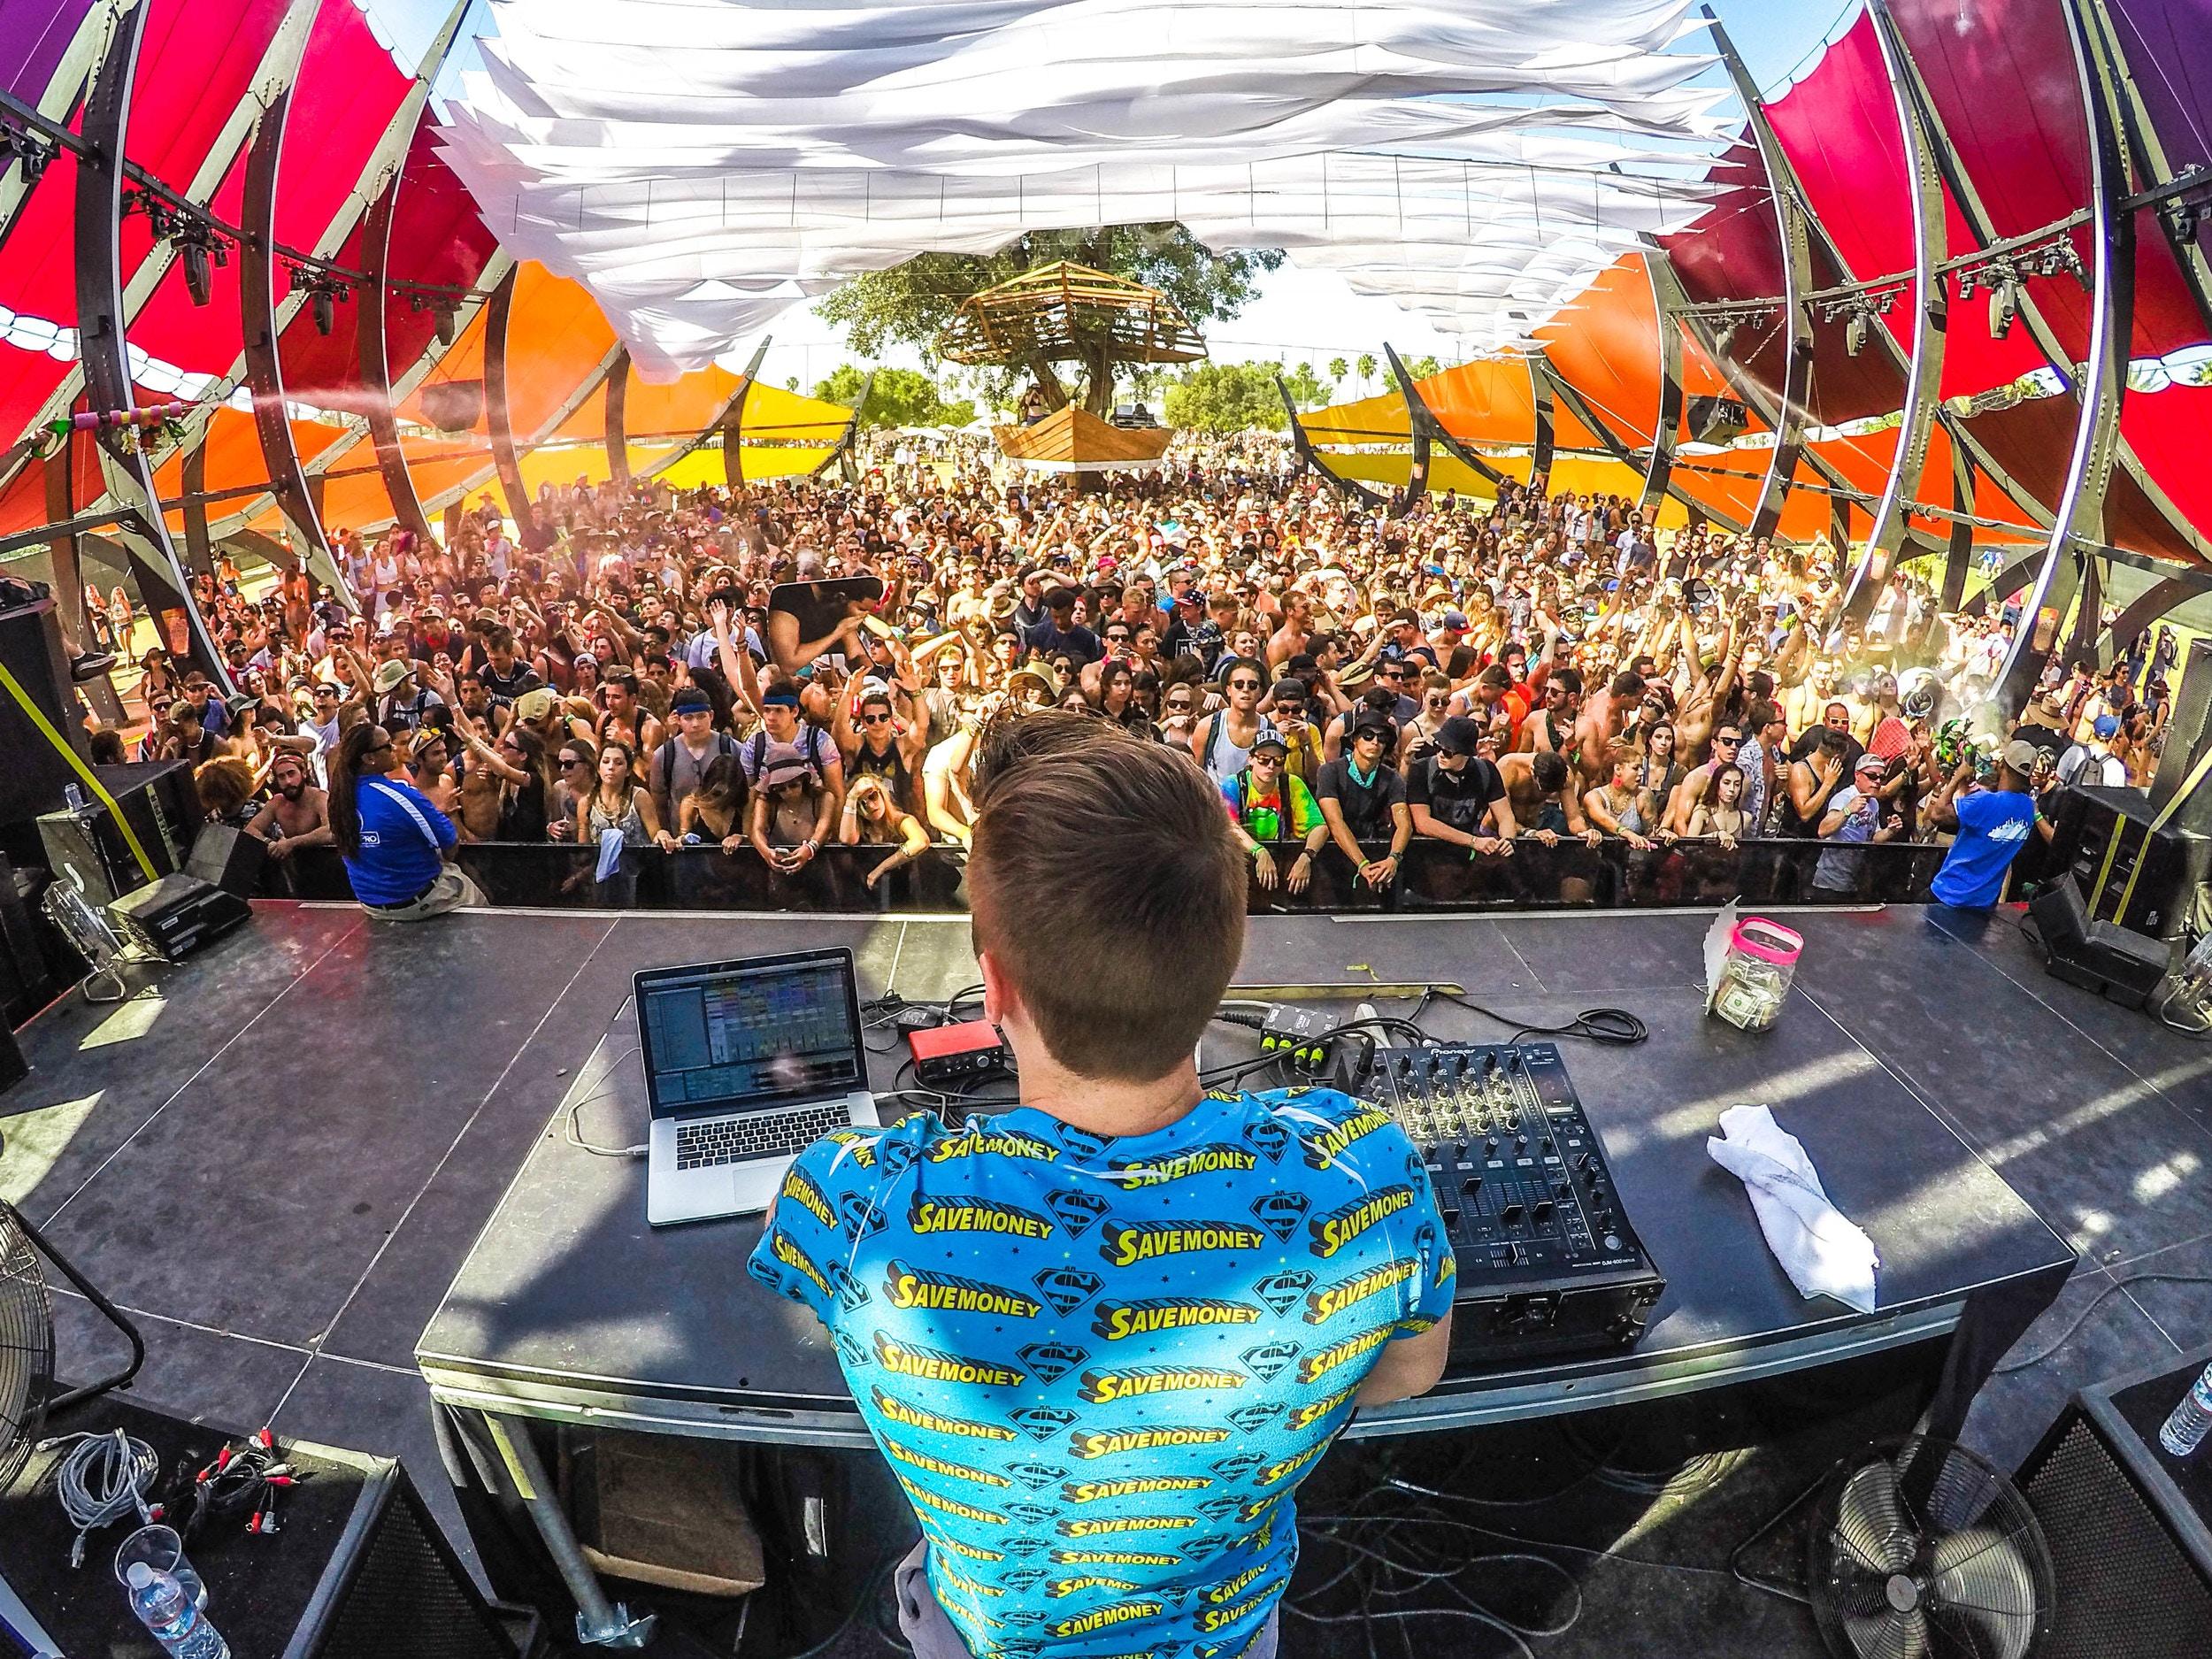 Ultimate Guide to Coachella Music Festival in 2019 | Skyscanner